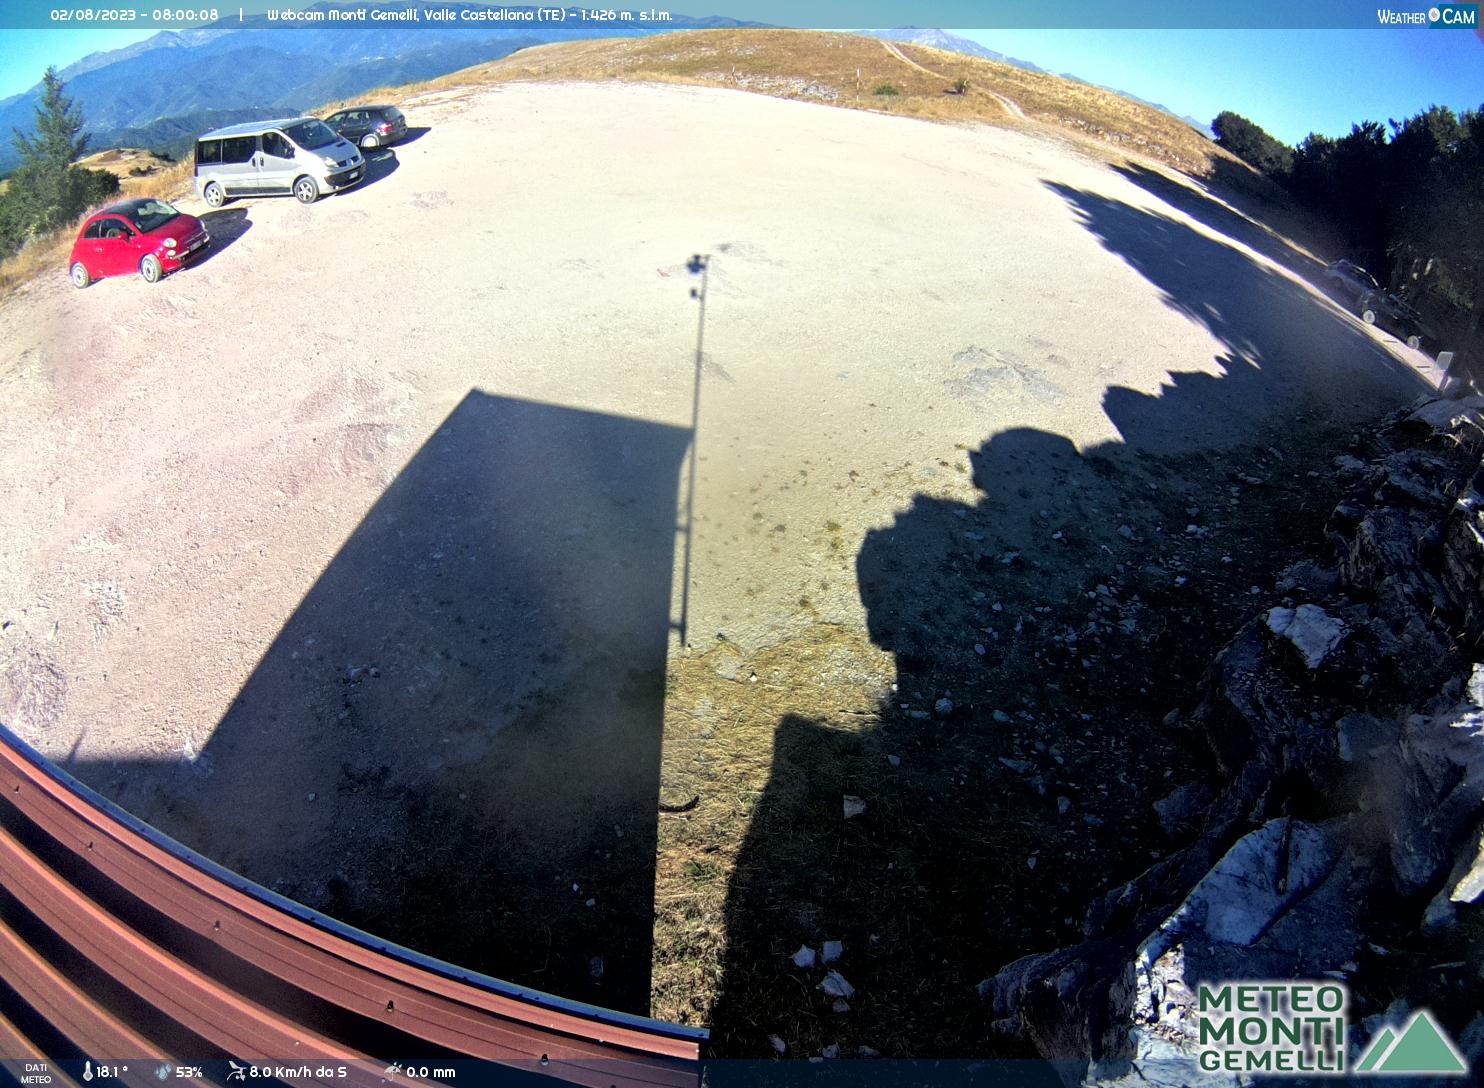 webcam Monti Gemelli (TE)